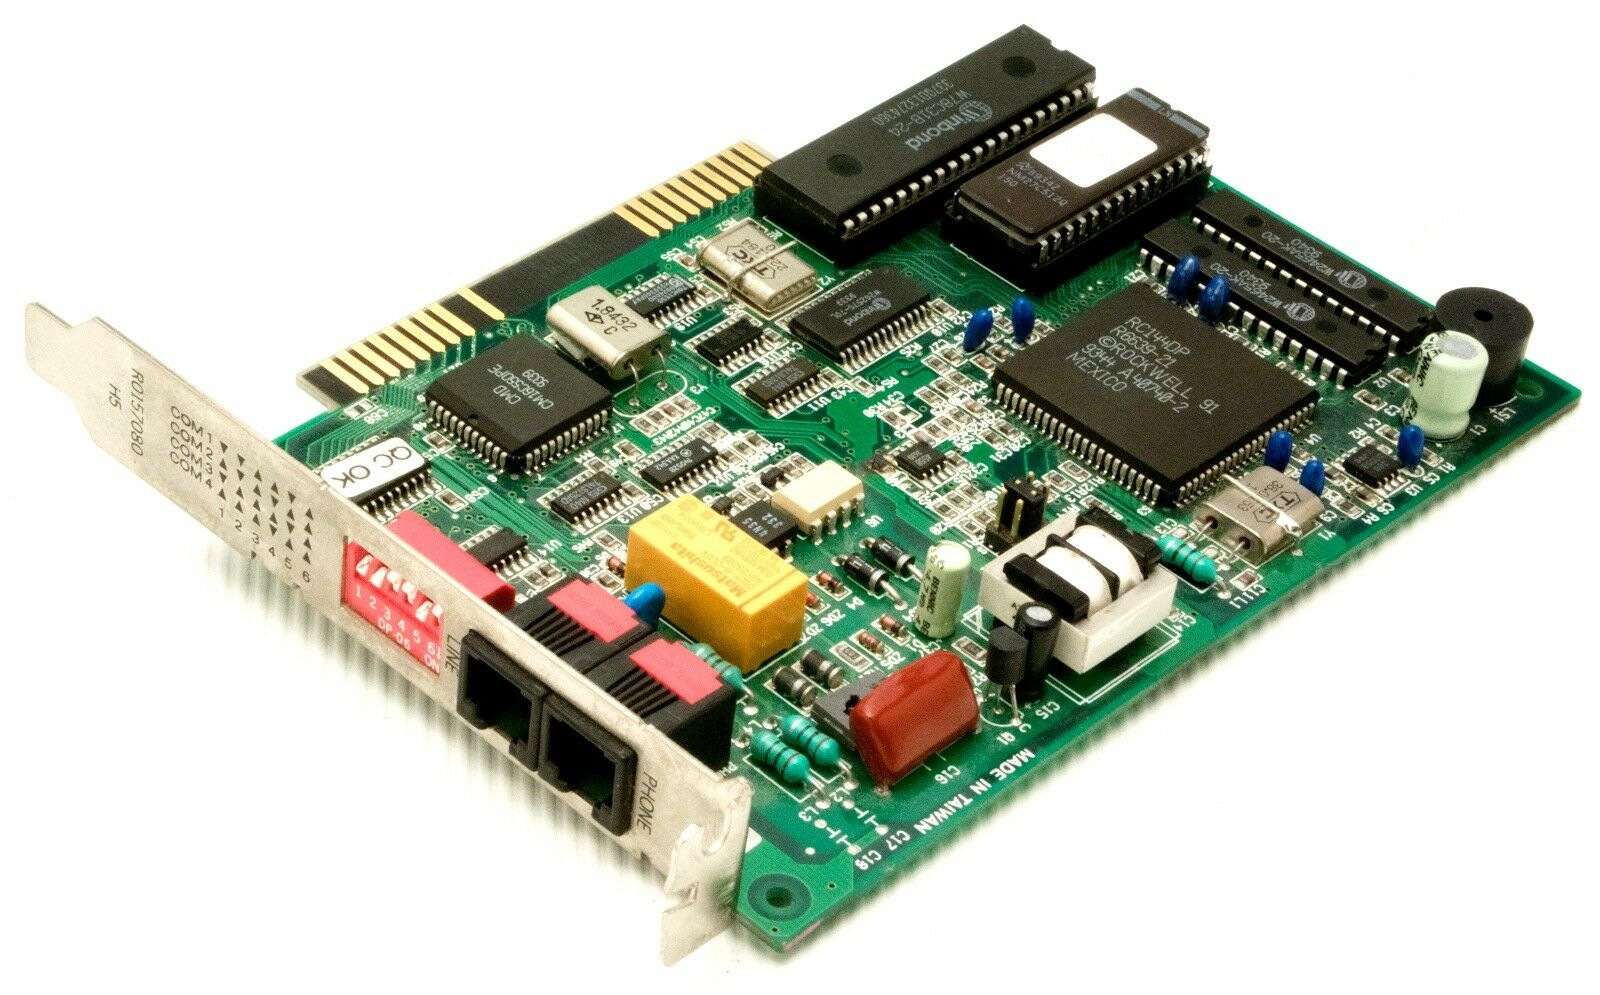 RARE INTEL PCFM7500 309409-002 ISA FAX 56K MODEM VOICE INTERNAL PC COM +MANUAL